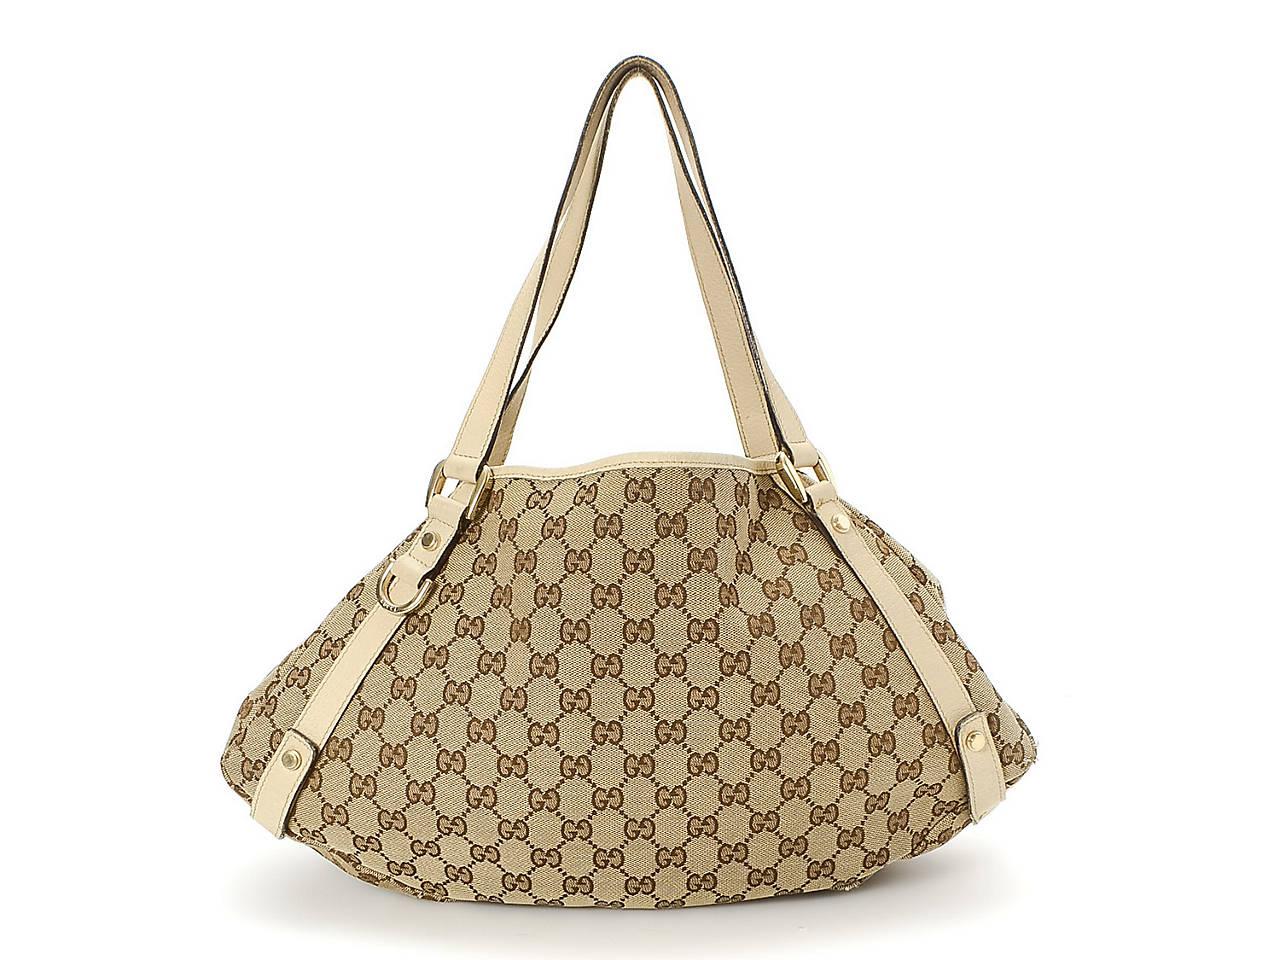 bce34b9b5e1 Gucci - Vintage Luxury Canvas GG Abbey Tote Women s Handbags ...